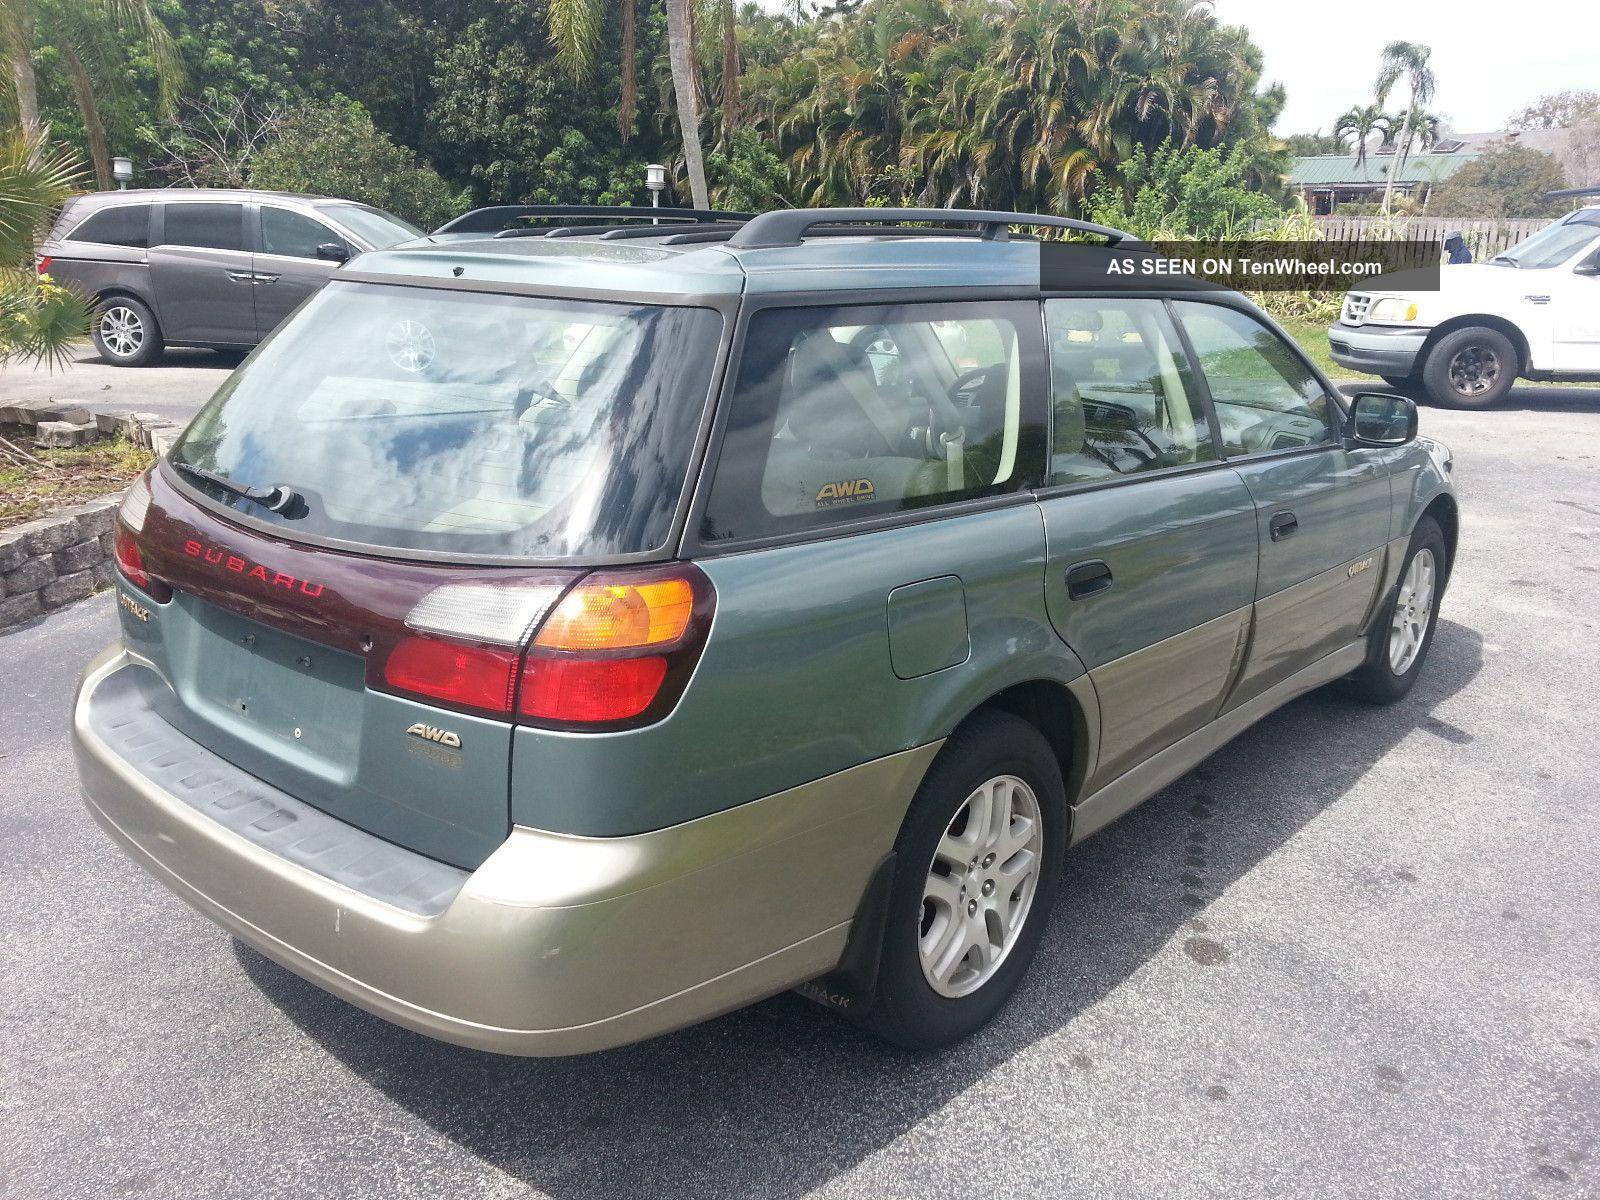 Honda Odyssey All Wheel Drive >> 2000 Subaru Outback Awd 4x4